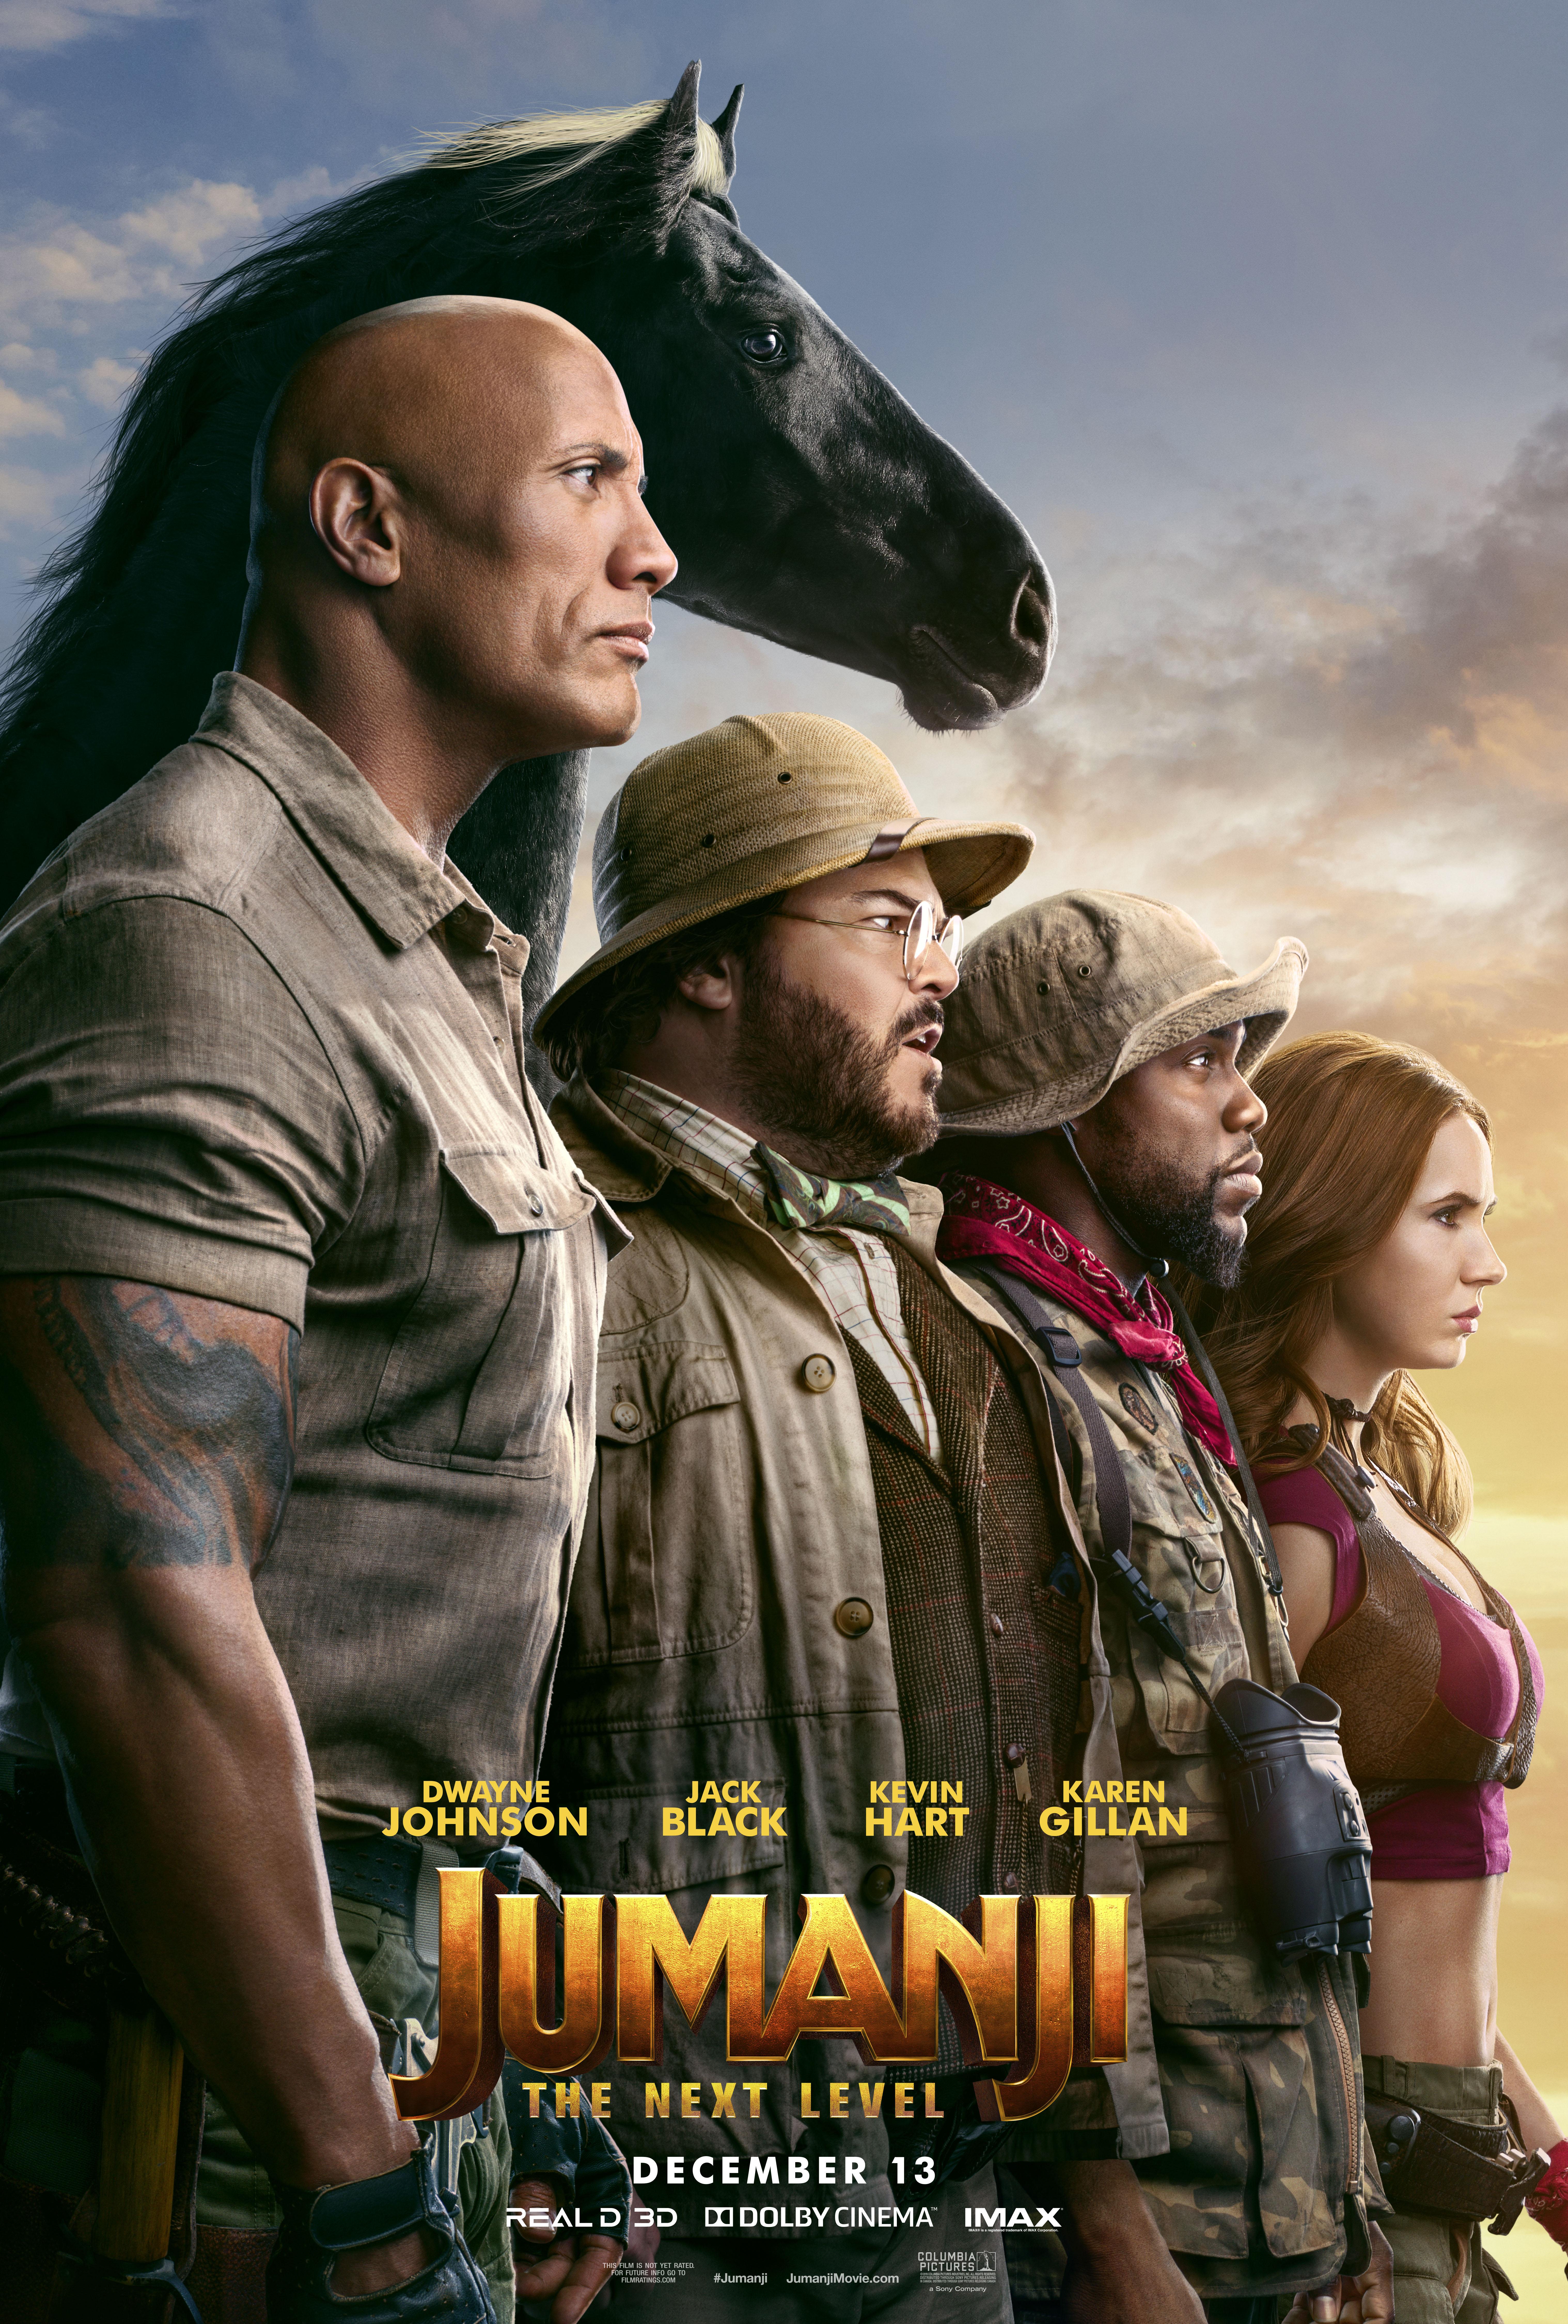 [PG-13] Jumanji: The Next Level (2019) Dual Audio Blu-Ray - 480P | 720P - x264 - 400MB | 900MB - Download & Watch Online Movie Poster - mlsbd